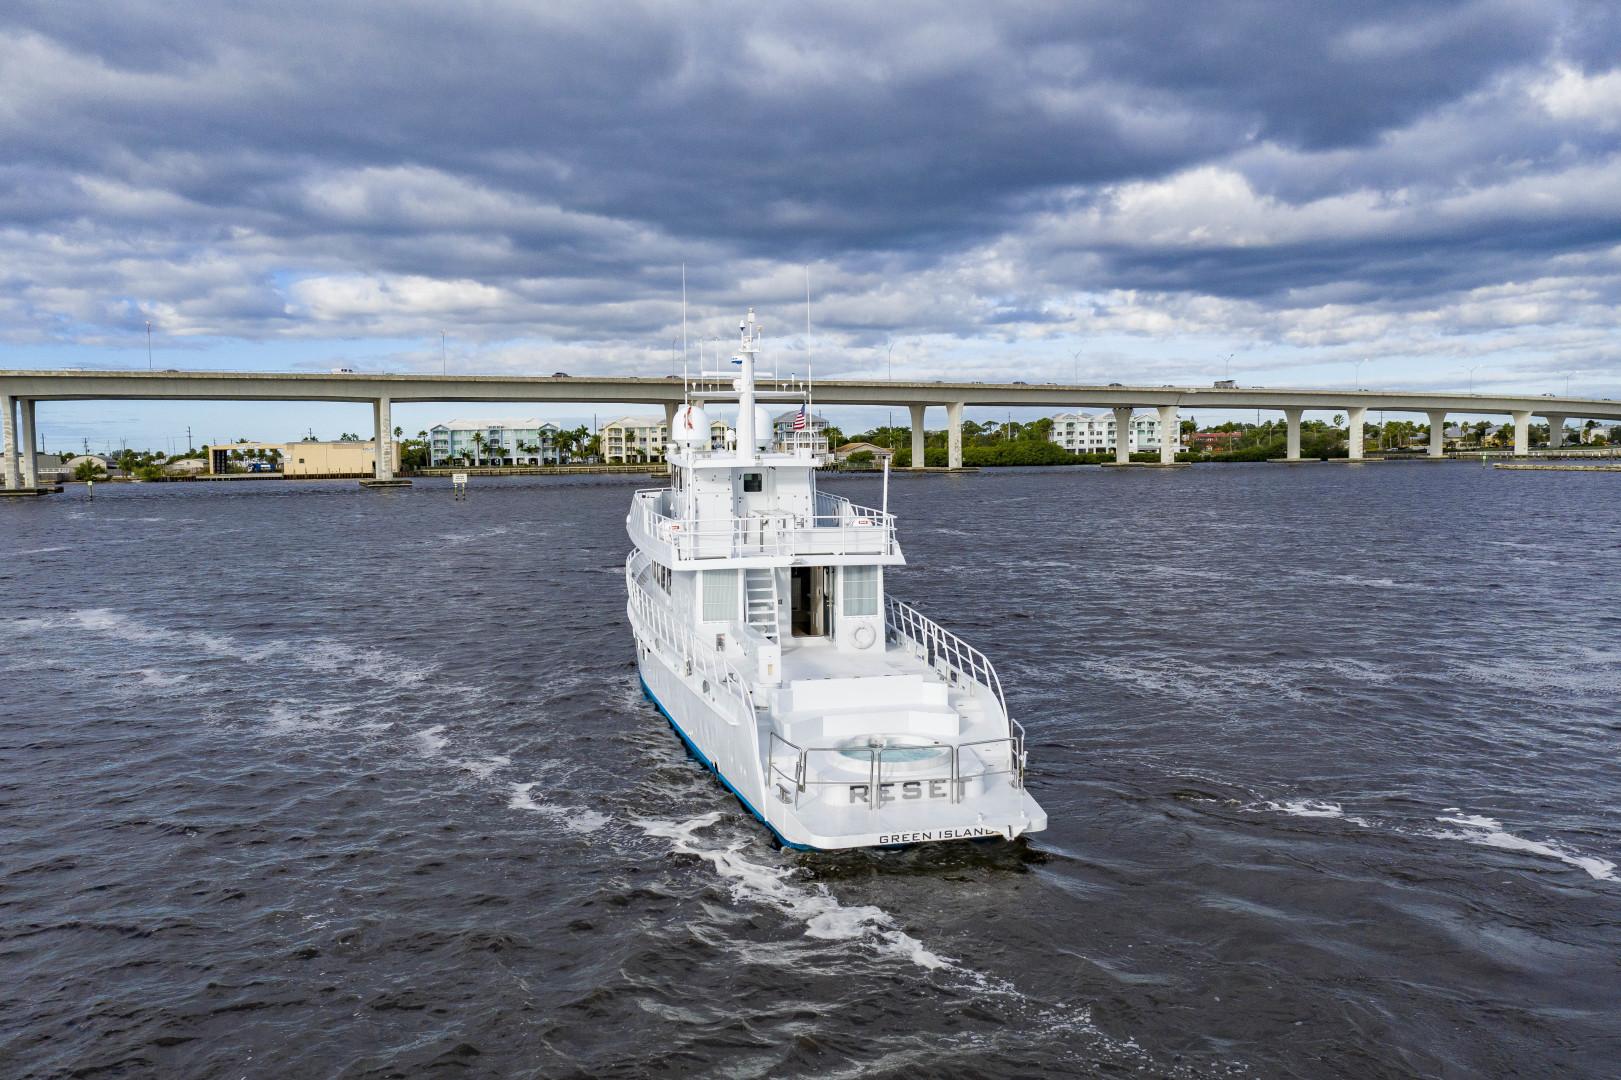 GlassTech-Expedition Yacht 2018-Reset Stuart-Florida-United States-Profile-1568535 | Thumbnail